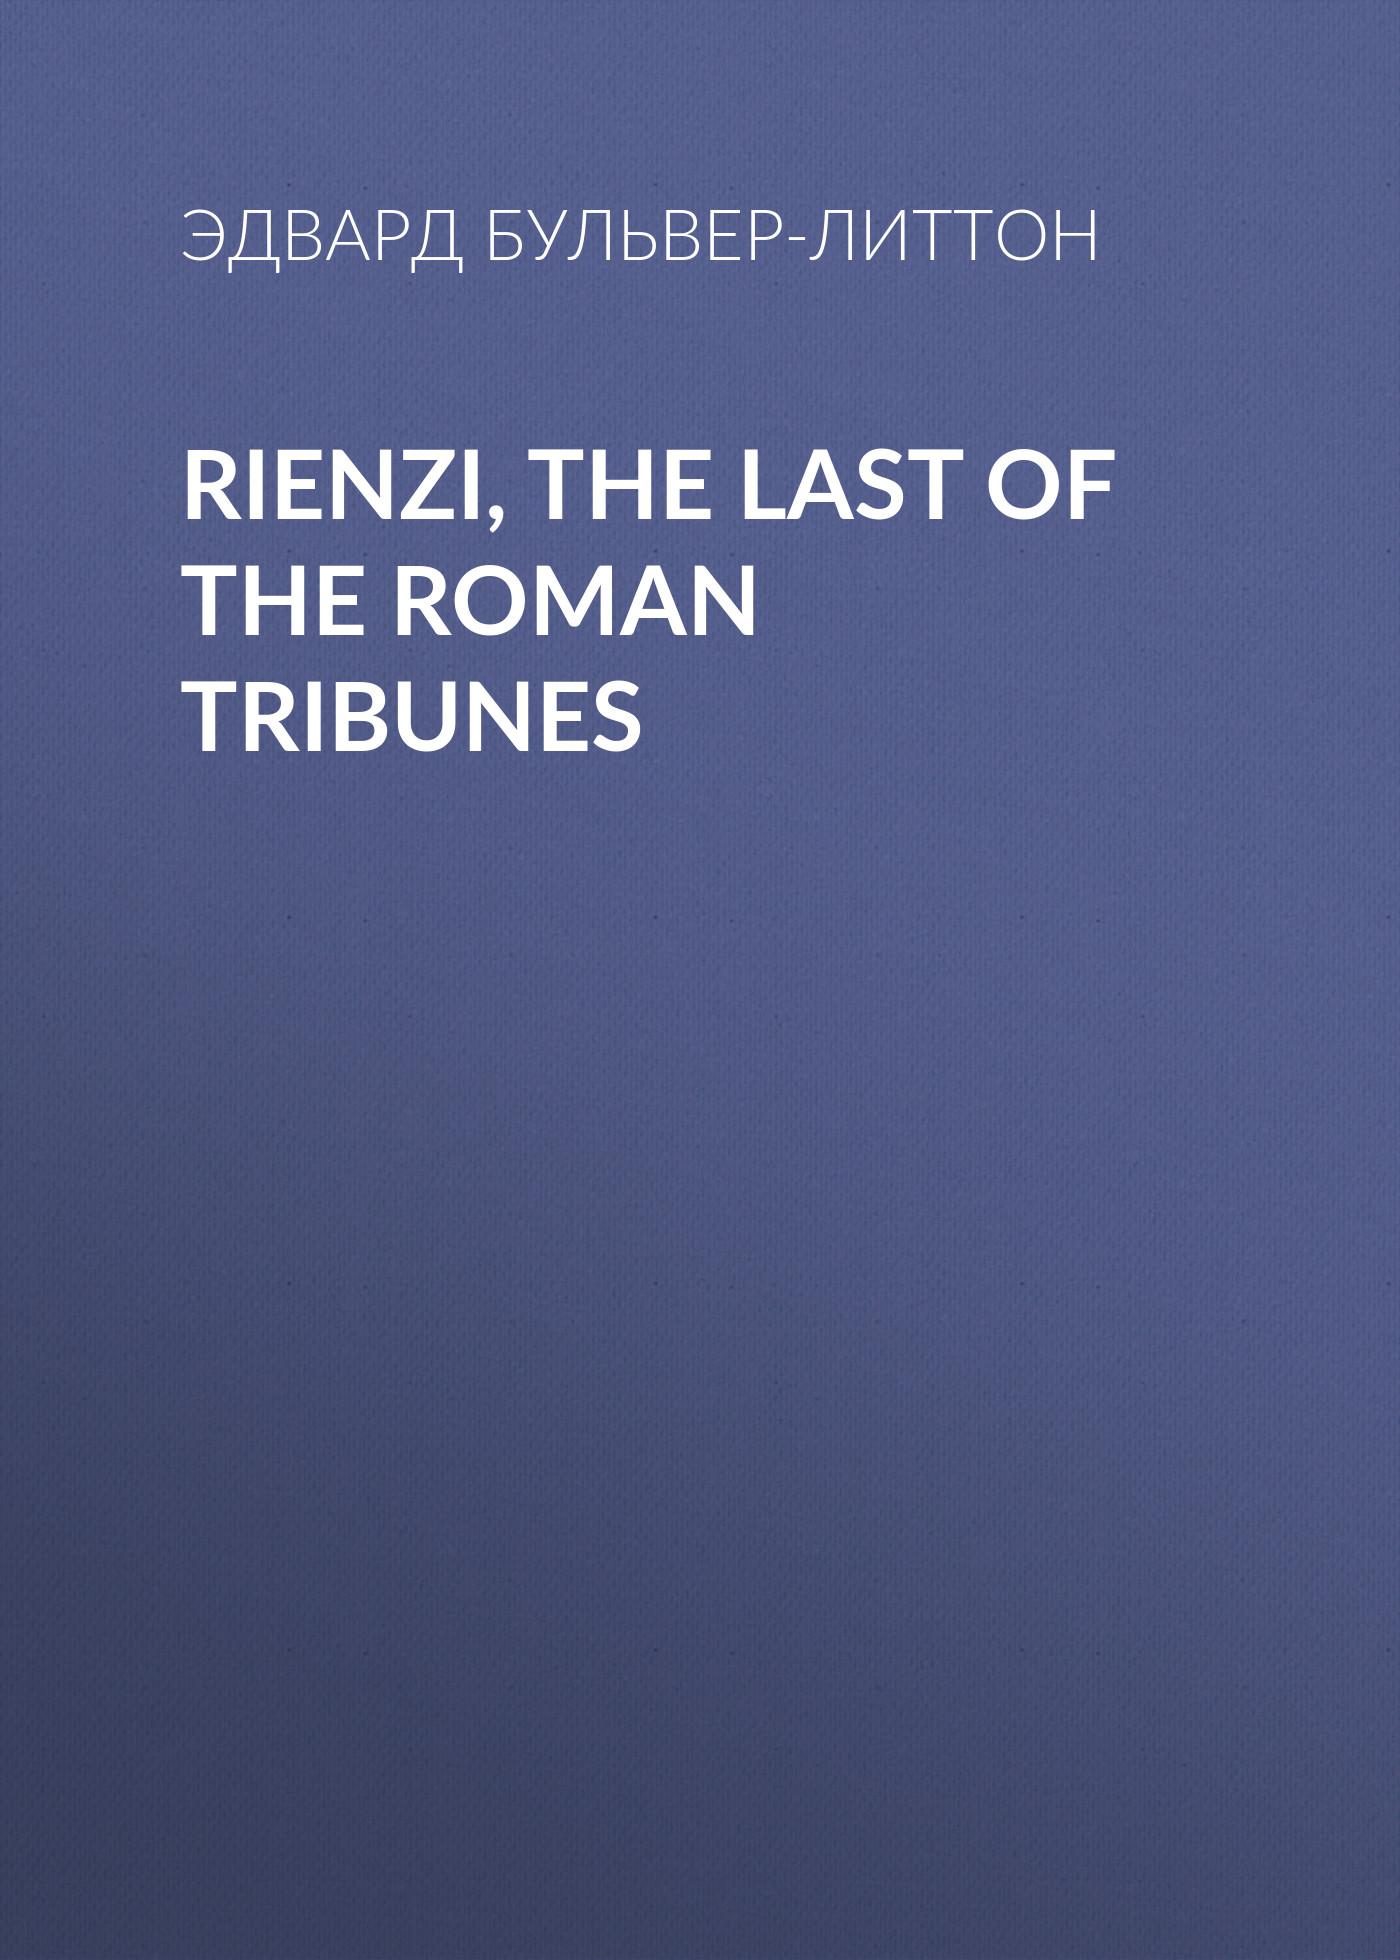 Rienzi, the Last of the Roman Tribunes ( Эдвард Бульвер-Литтон  )